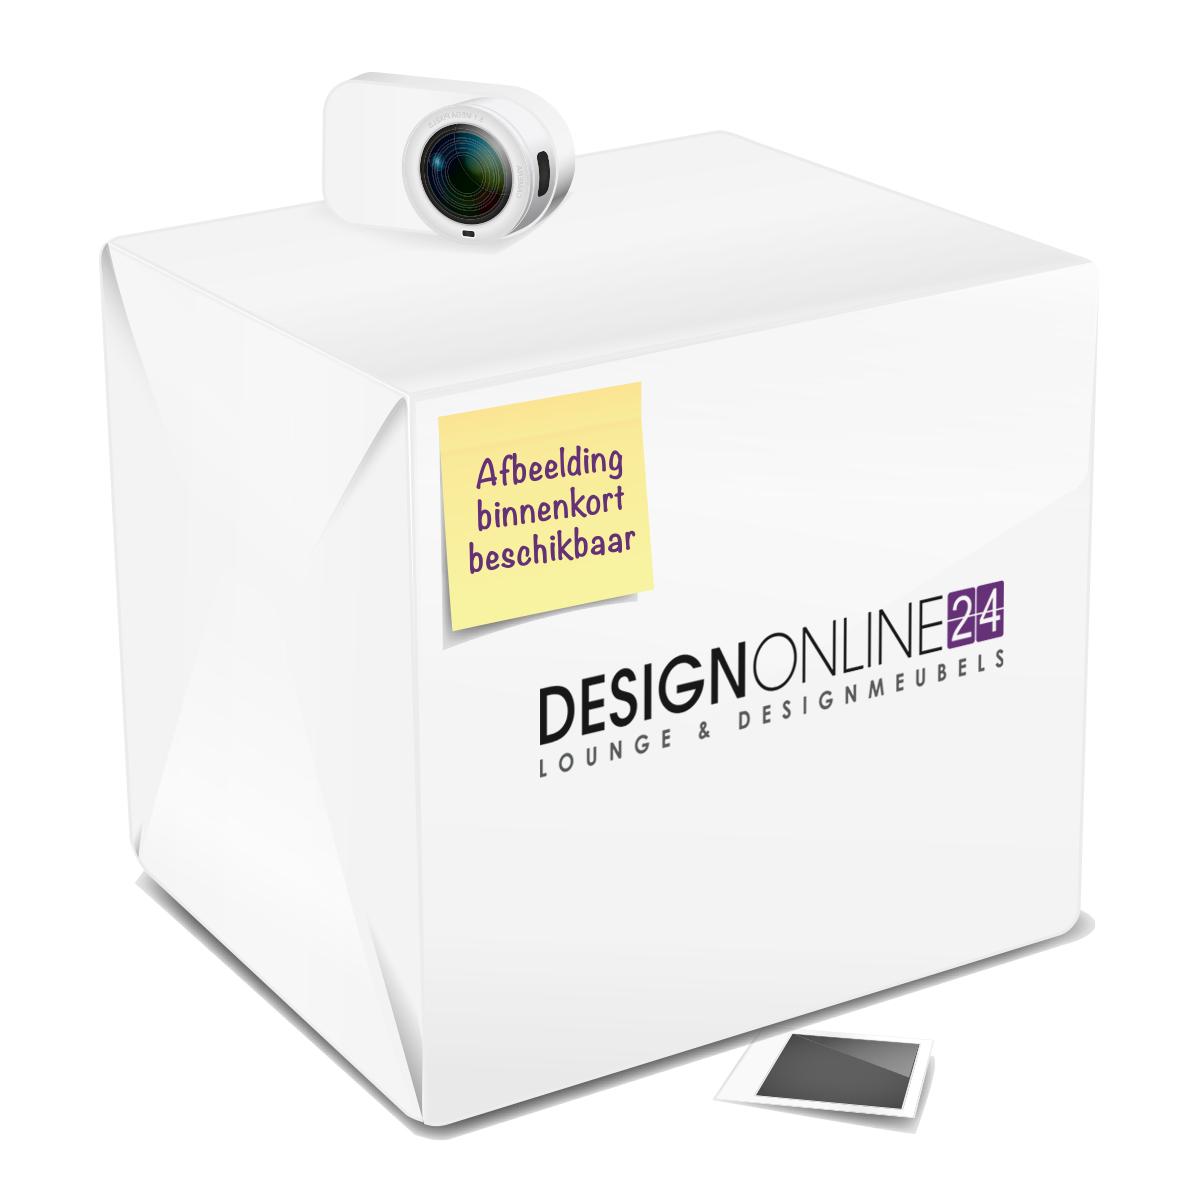 d-Bodhi d-Bodhi Fendy Locker Kast - 3 Deurs - L120 x B40 x H160 cm - Teakhout + Gratis Design Tafellamp twv € 79,95